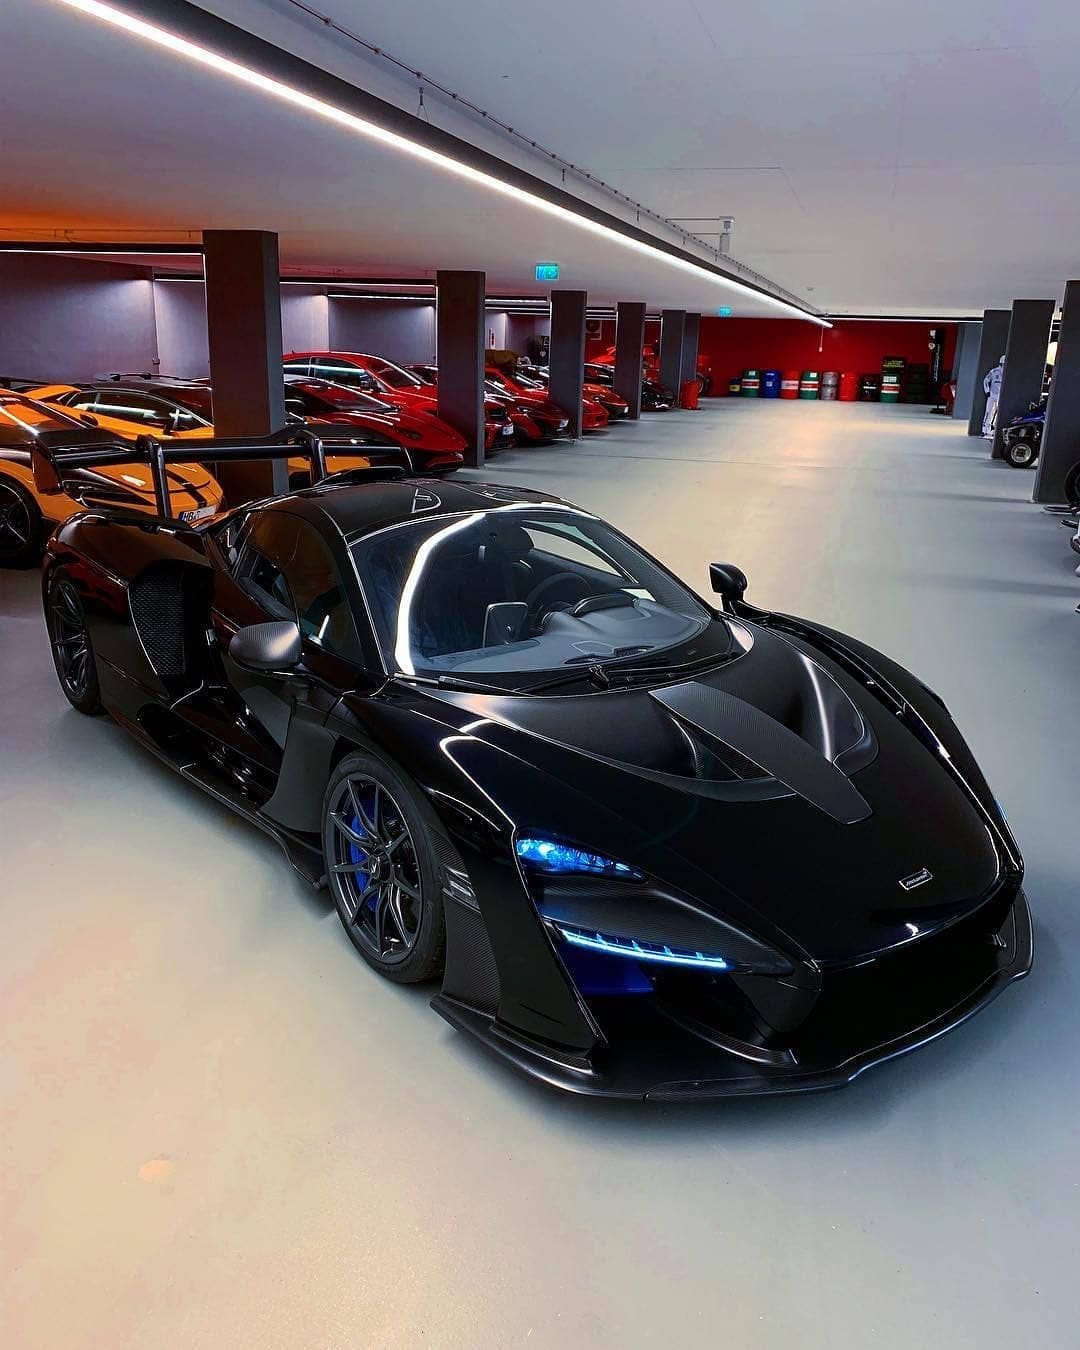 Dark Senna Matter Name 3 Better Hypercars Follow Supercarsbuzzitalia If You Are Italian Too Super Cars New Mclaren Car